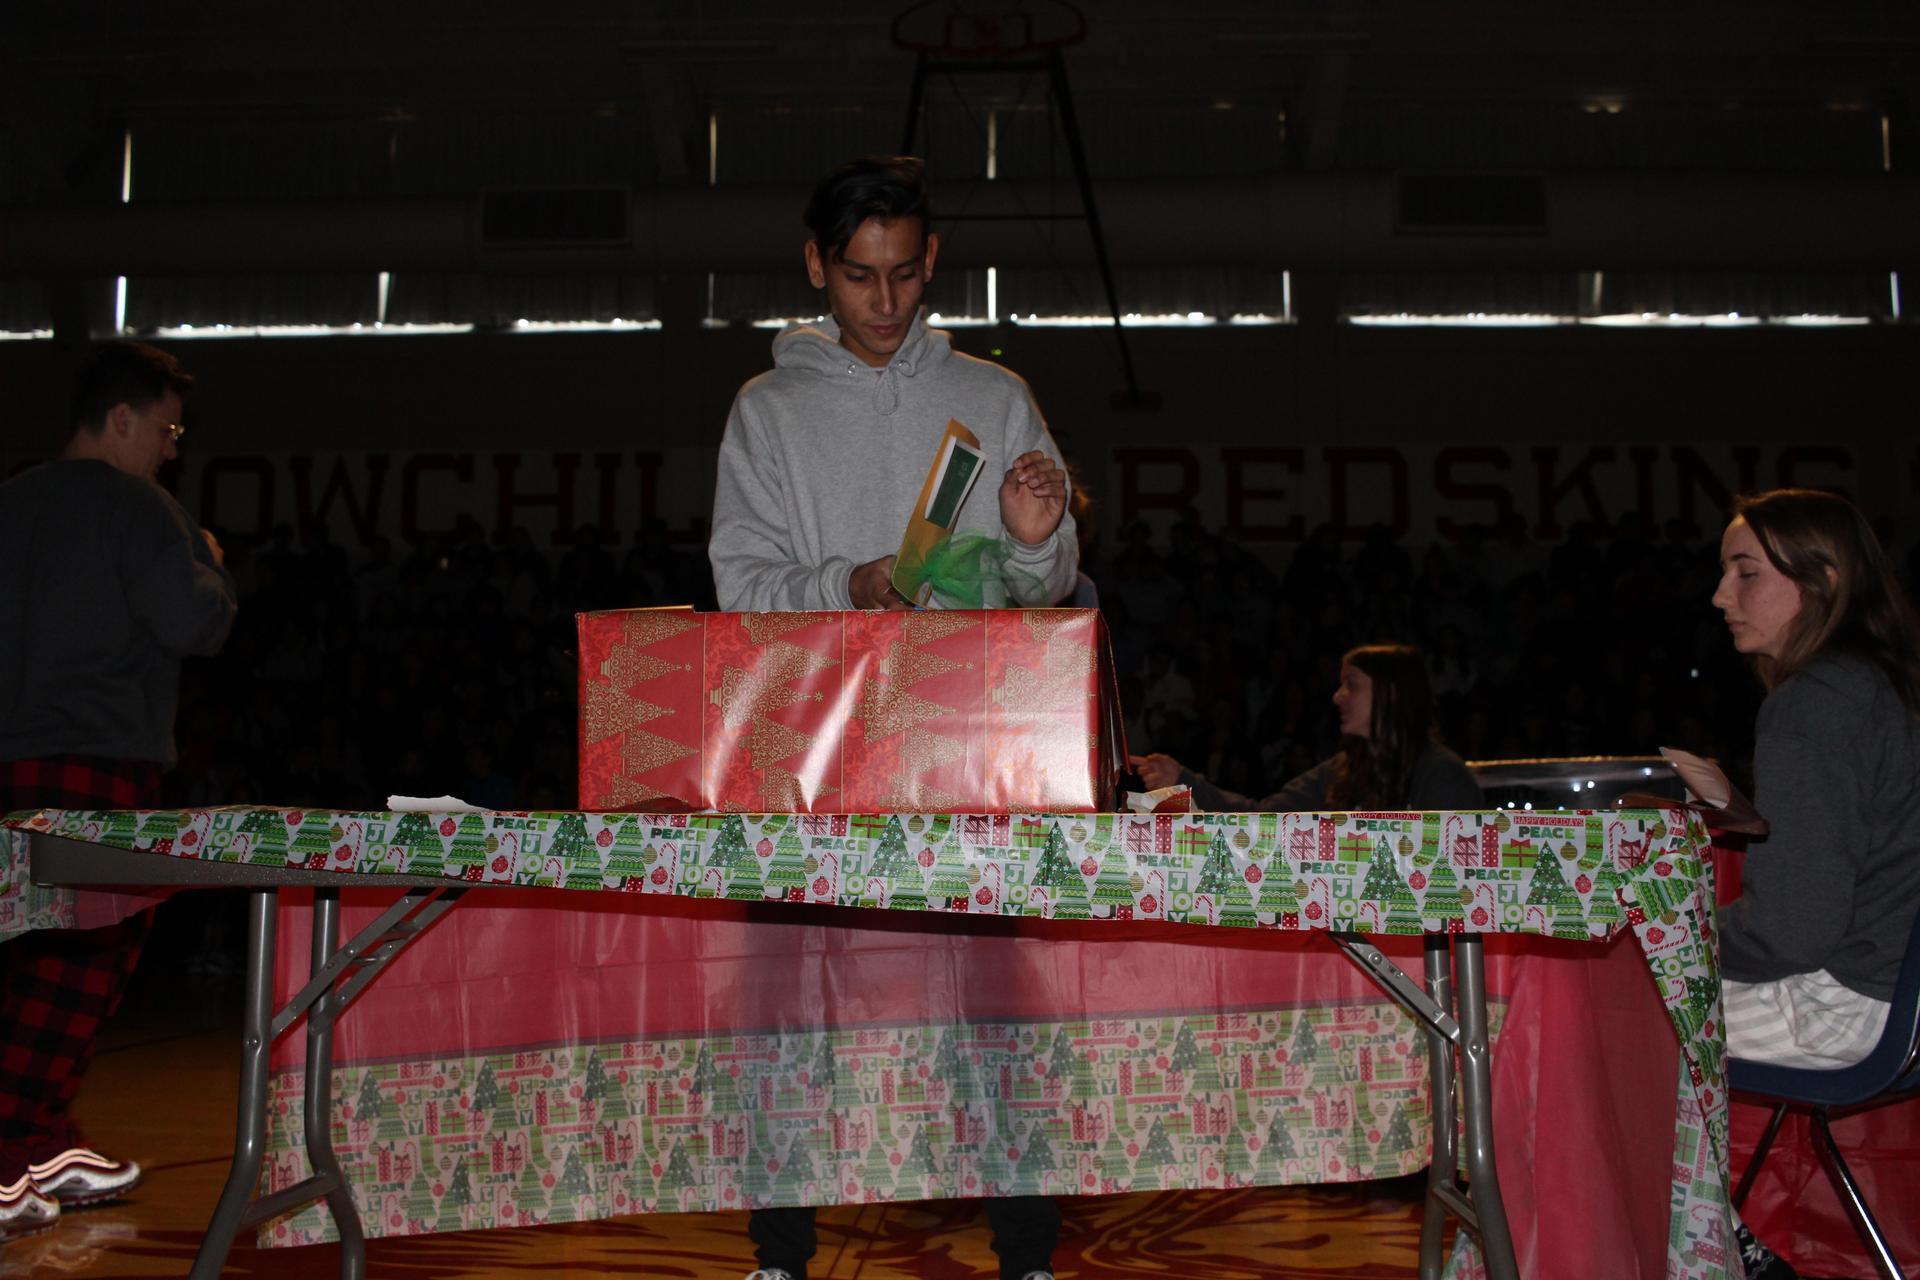 Nicholas Martinez opening his gift